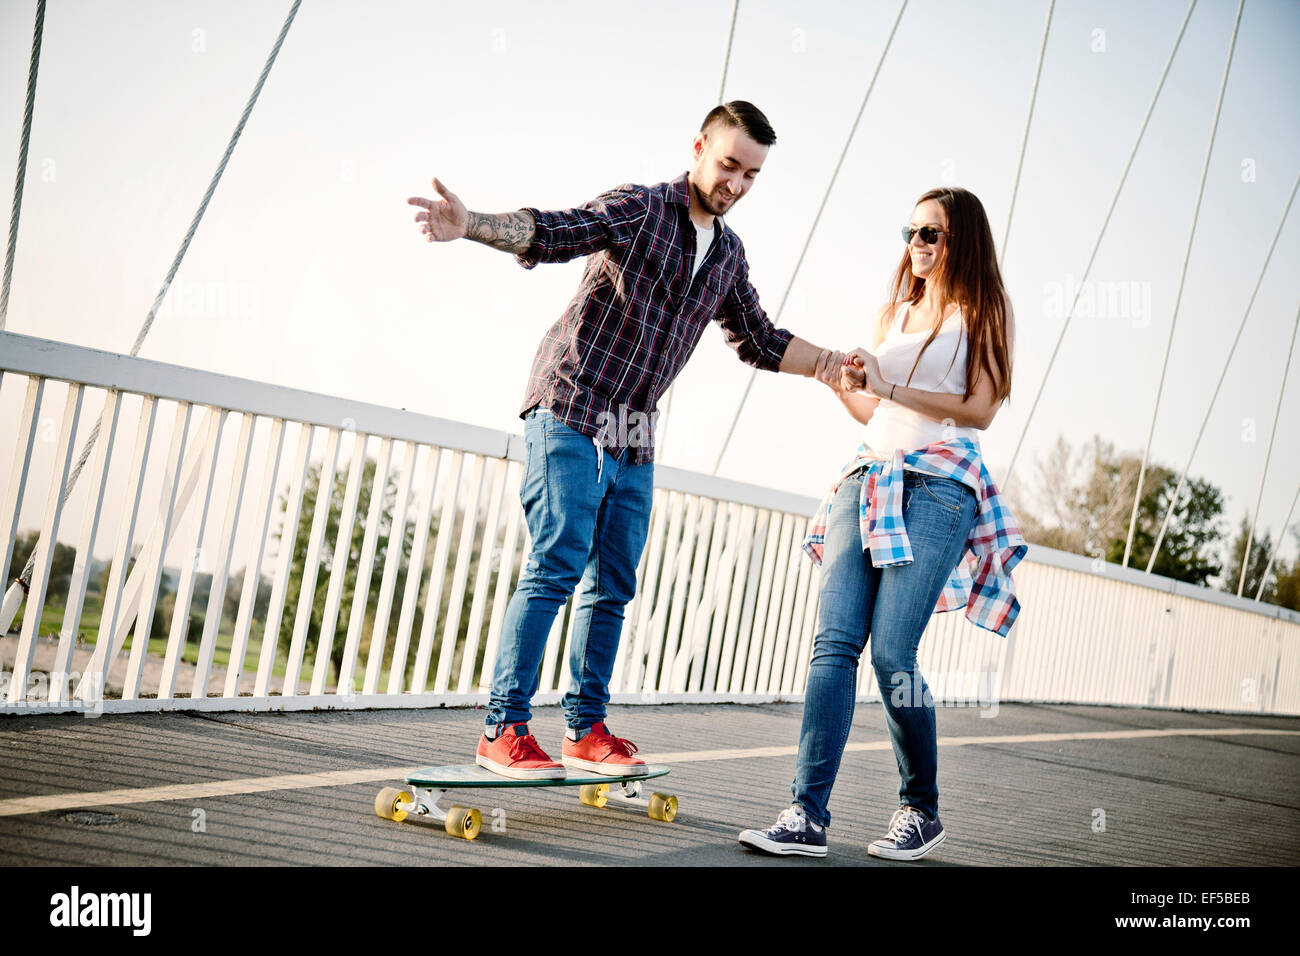 Junger Mann, balancieren auf Skateboard, Frau Unterstützung Stockbild